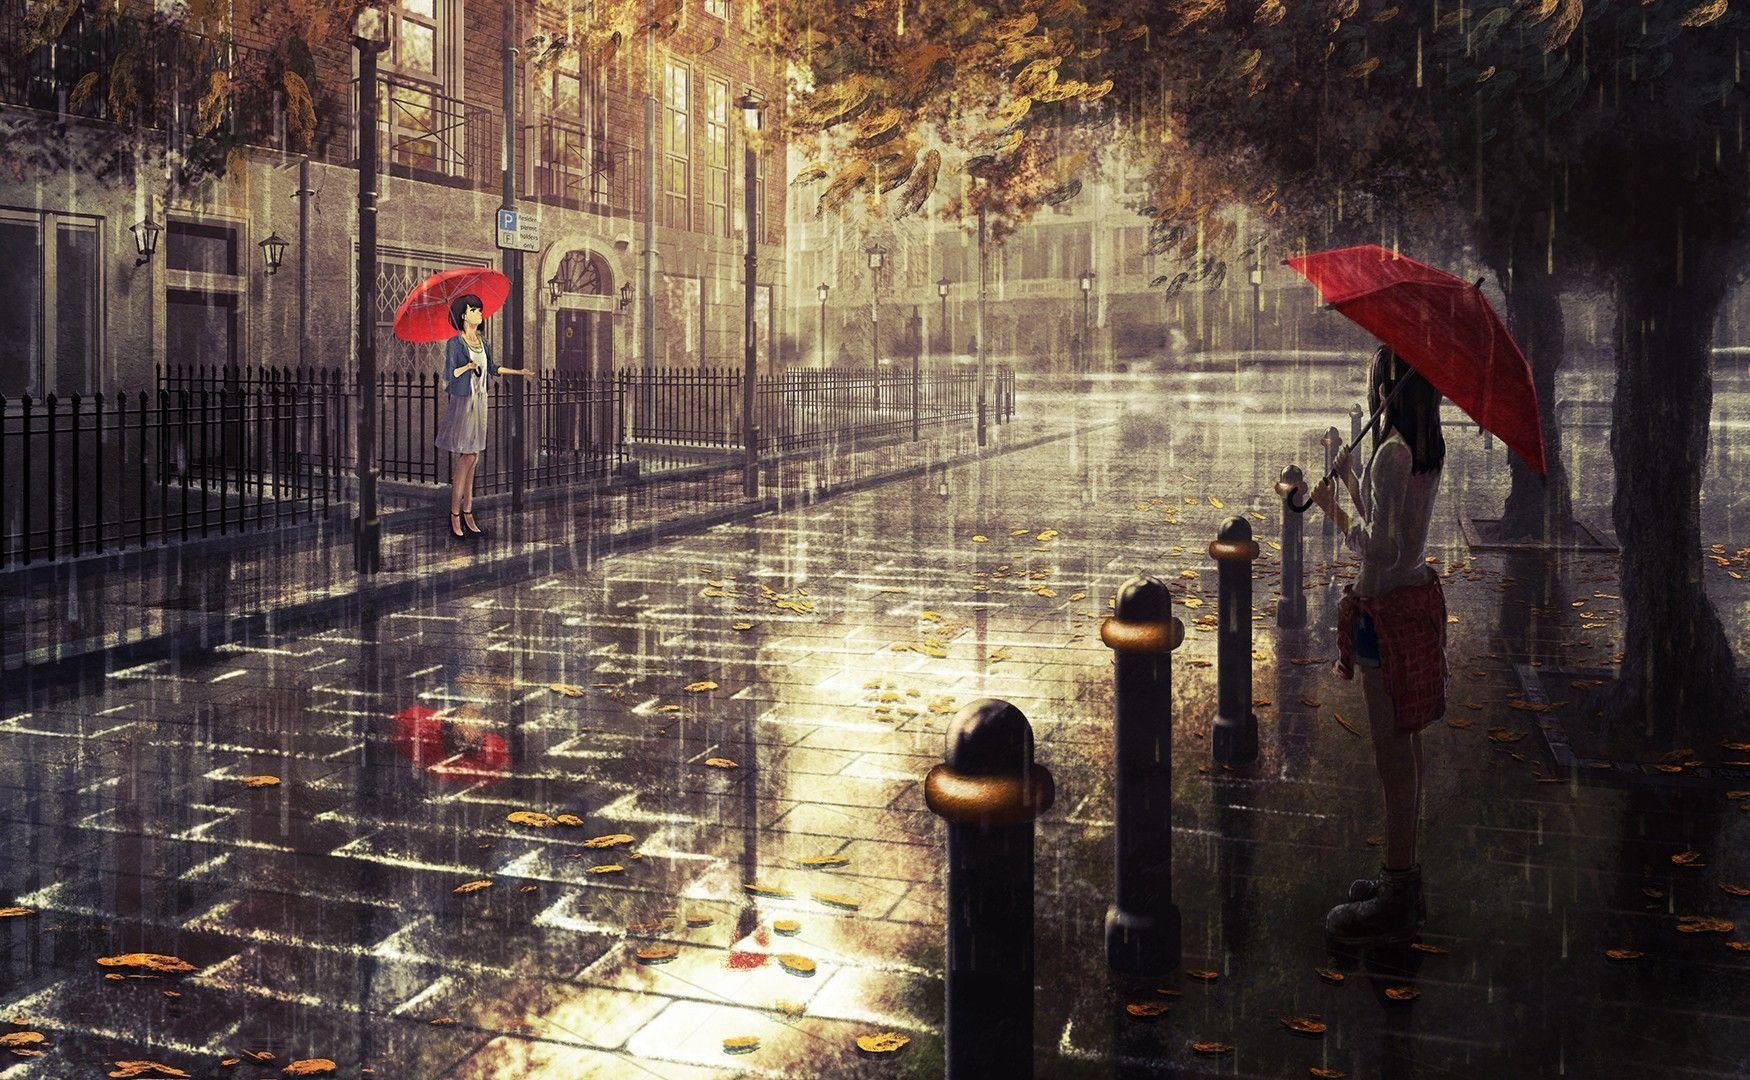 Umbrella And Rain Anime Wallpapers Wallpaper Cave Rain Wallpapers Umbrella Art Fall Artwork